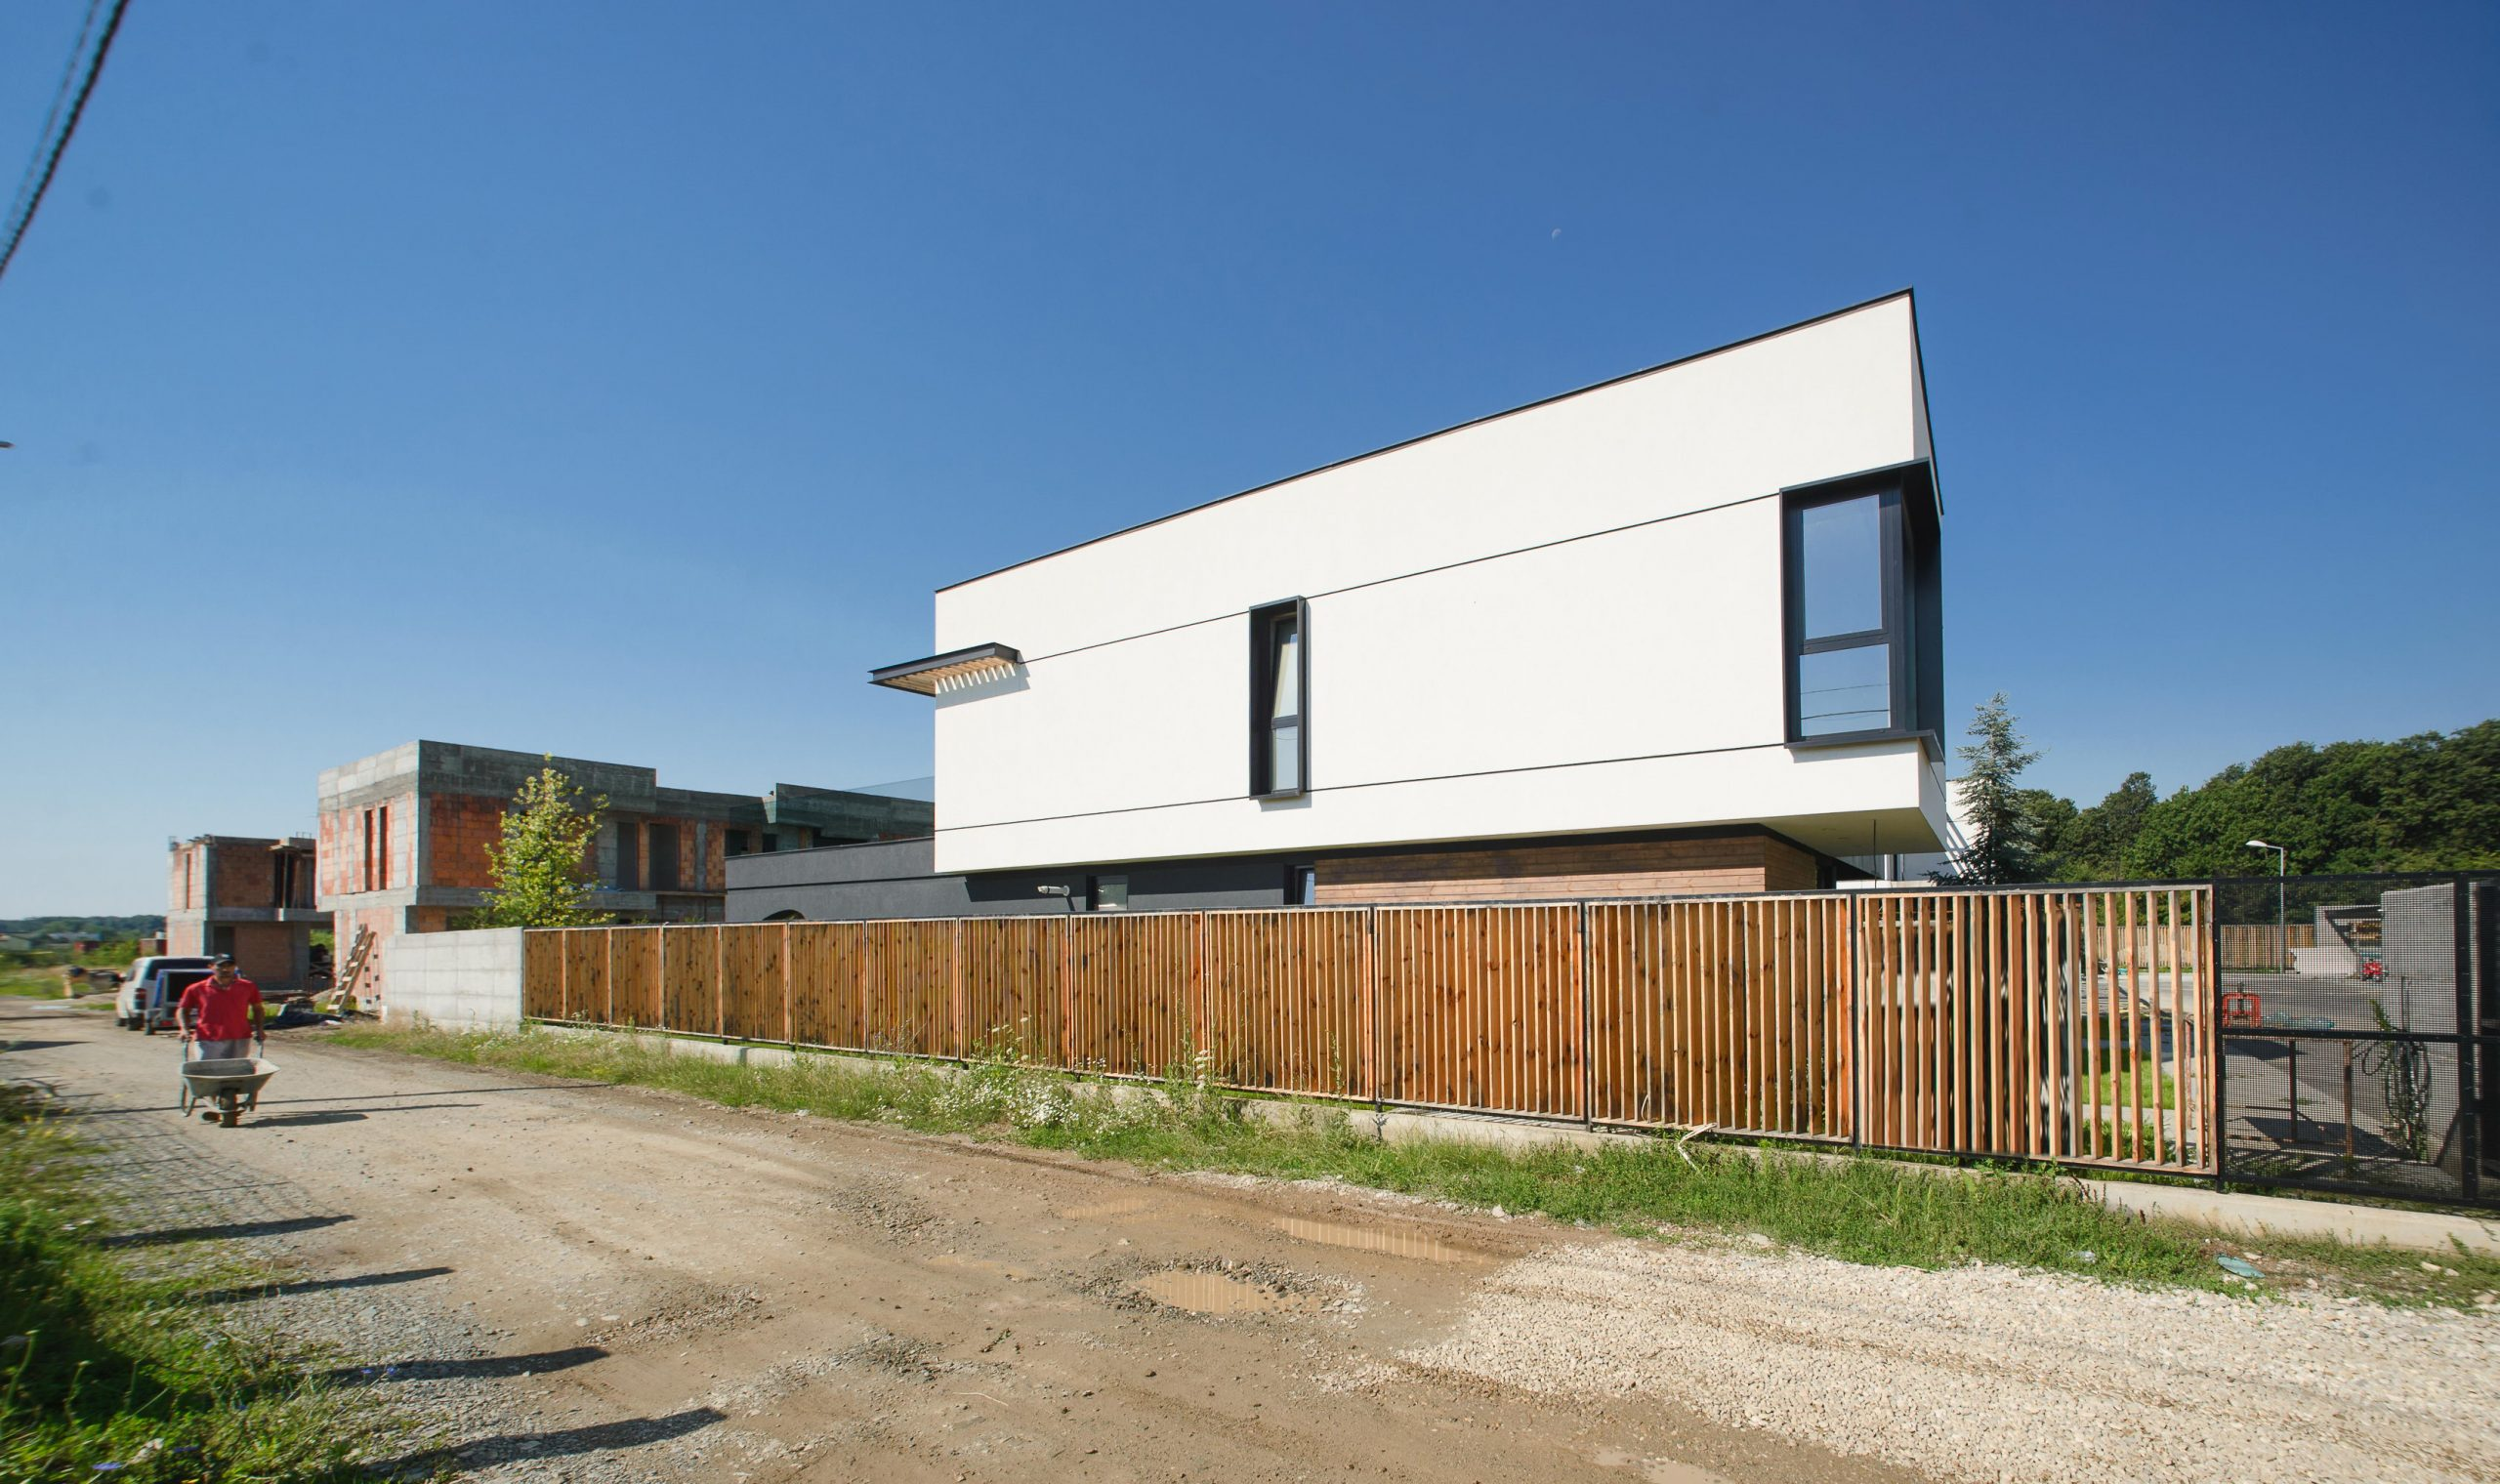 https://nbc-arhitect.ro/wp-content/uploads/2020/10/NBC-Arhitect-_-Arcstil_Residence-_-Romania-_-exterior-view_7-scaled.jpg